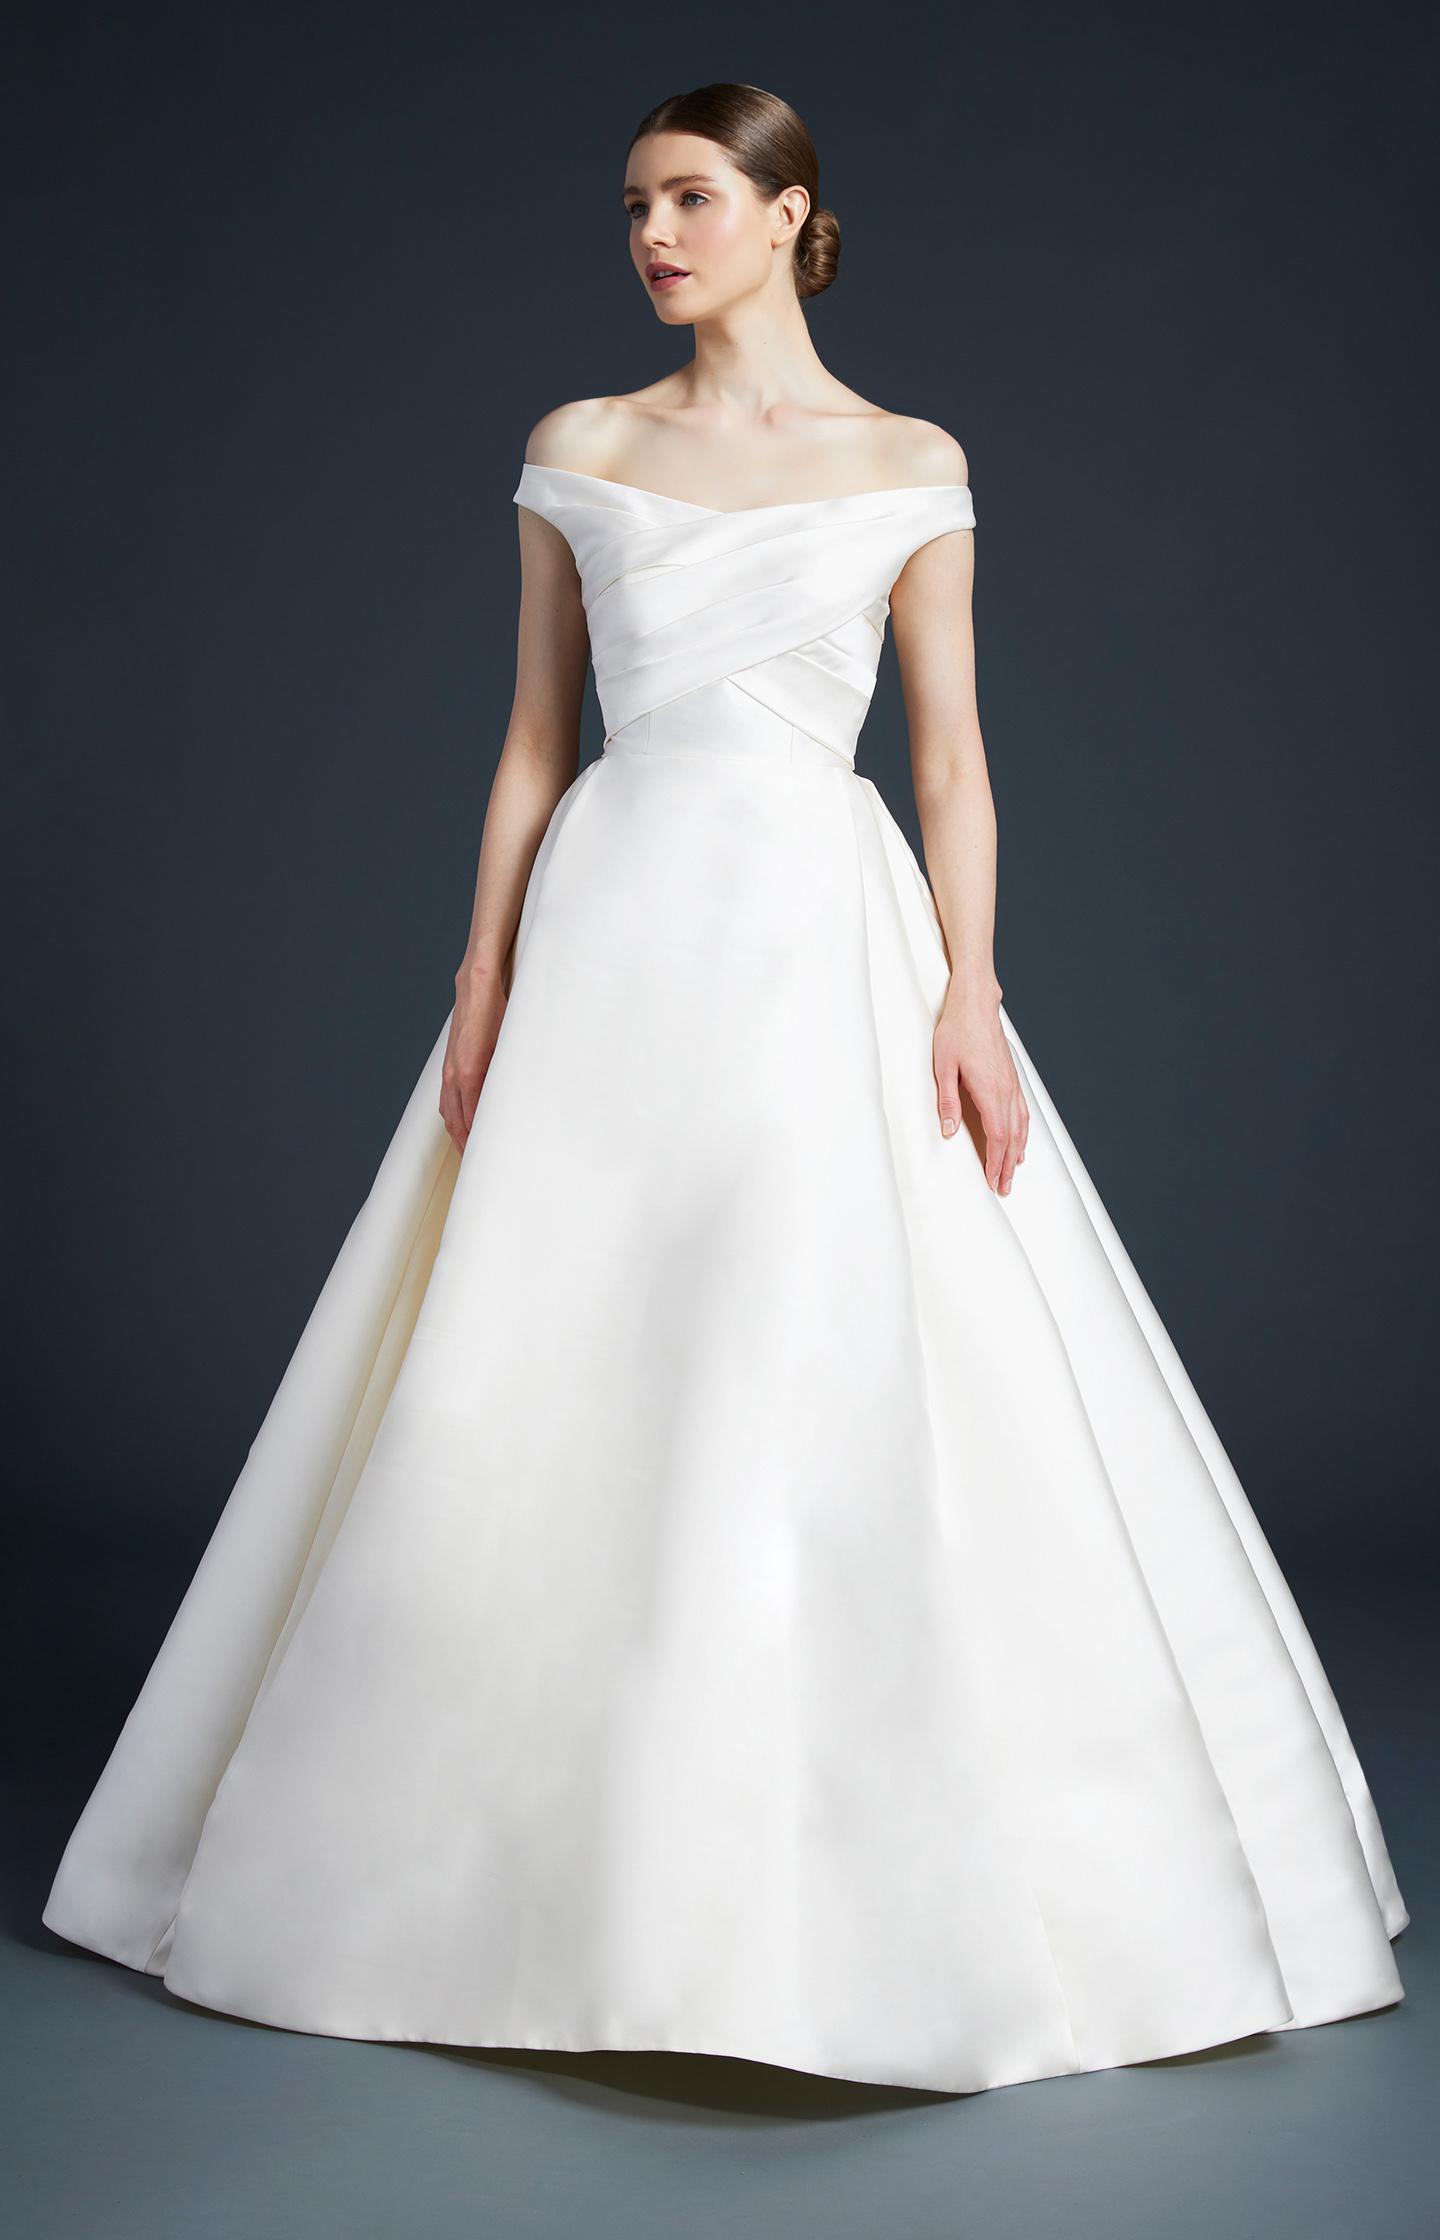 anne barge off the shoulder wedding dress fall 2019